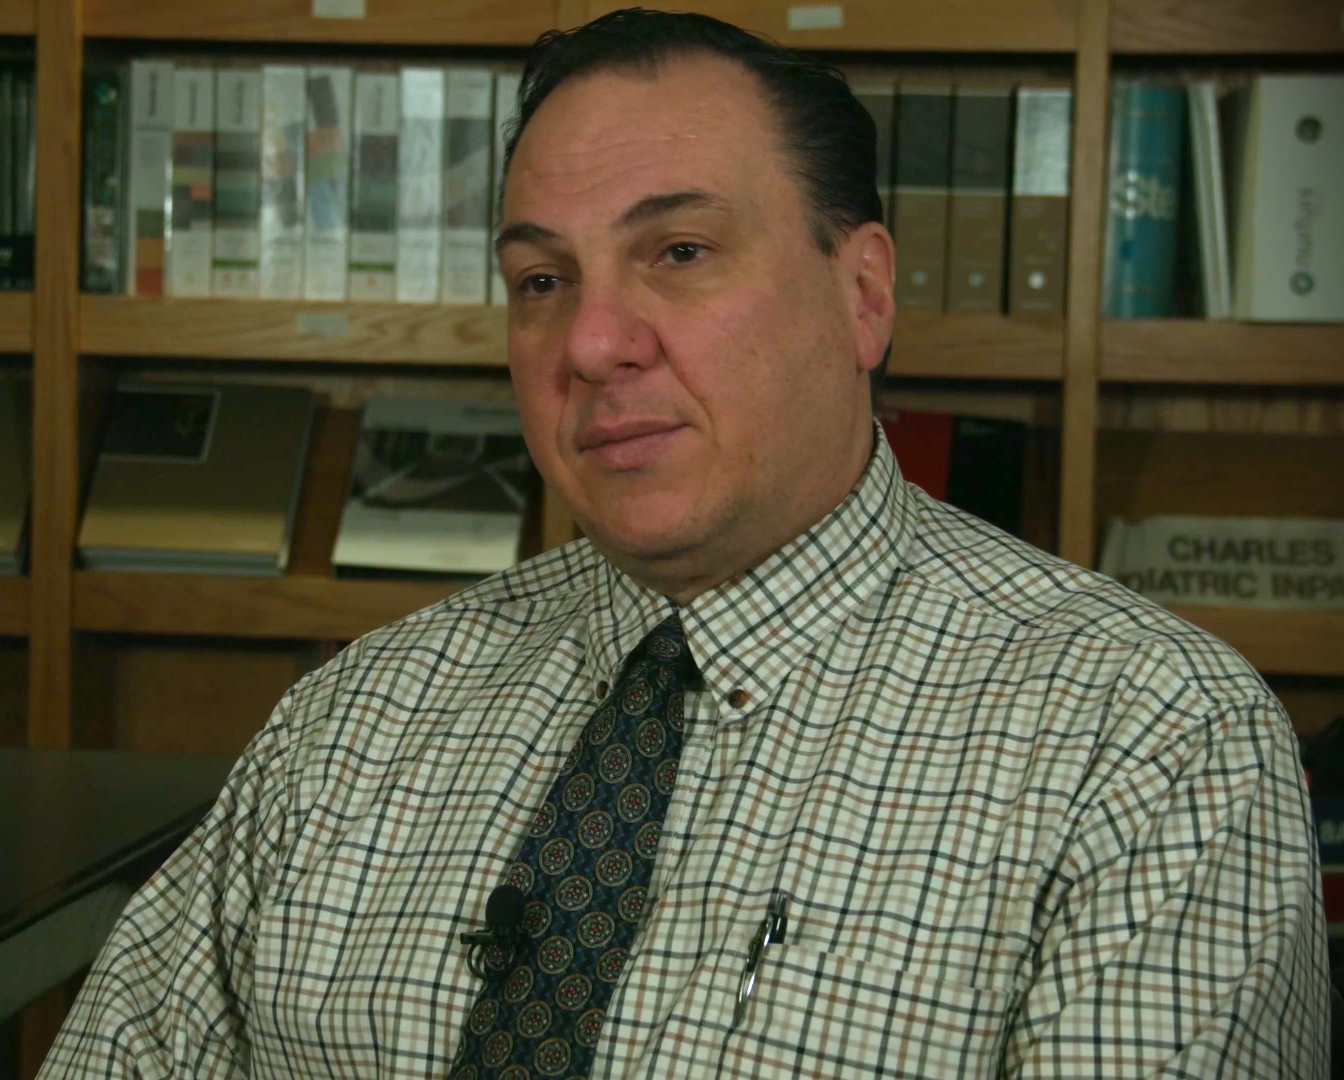 Cogen partner - Emilio Genzano, Albany Medical Center